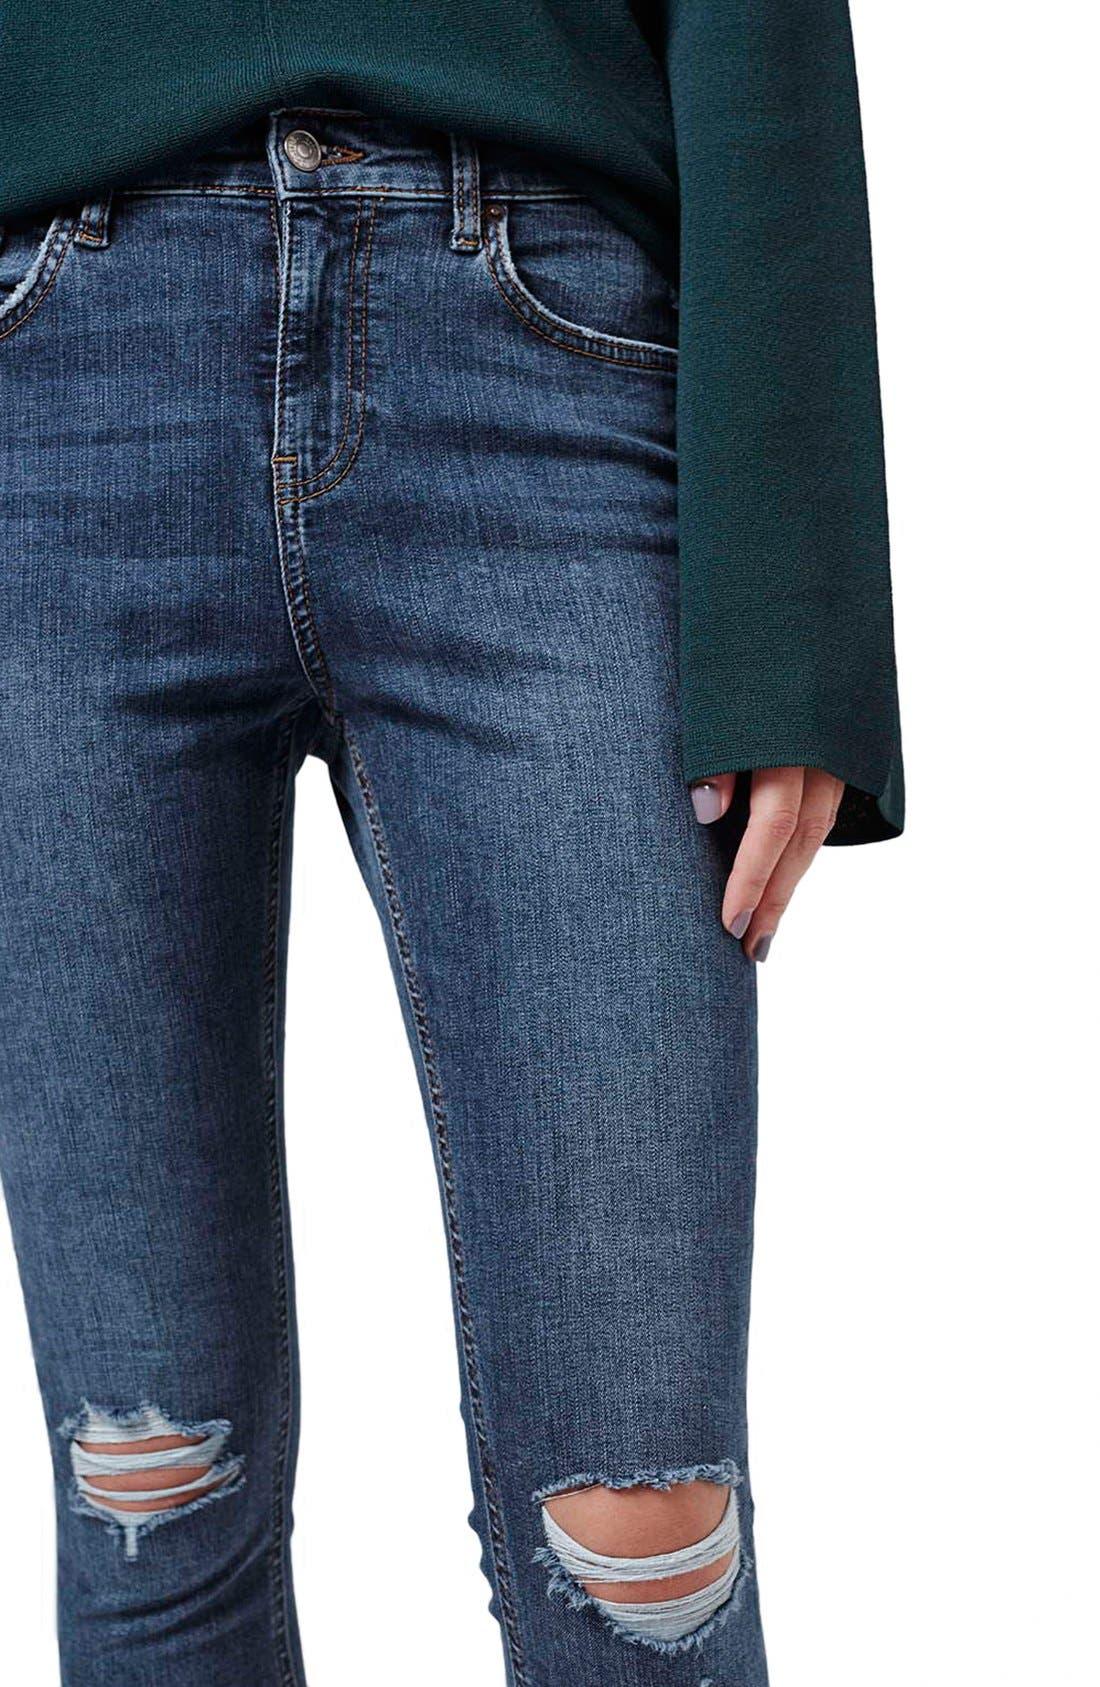 Alternate Image 5  - Topshop Moto 'Jamie' Ripped Skinny Ankle Jeans (Petite)